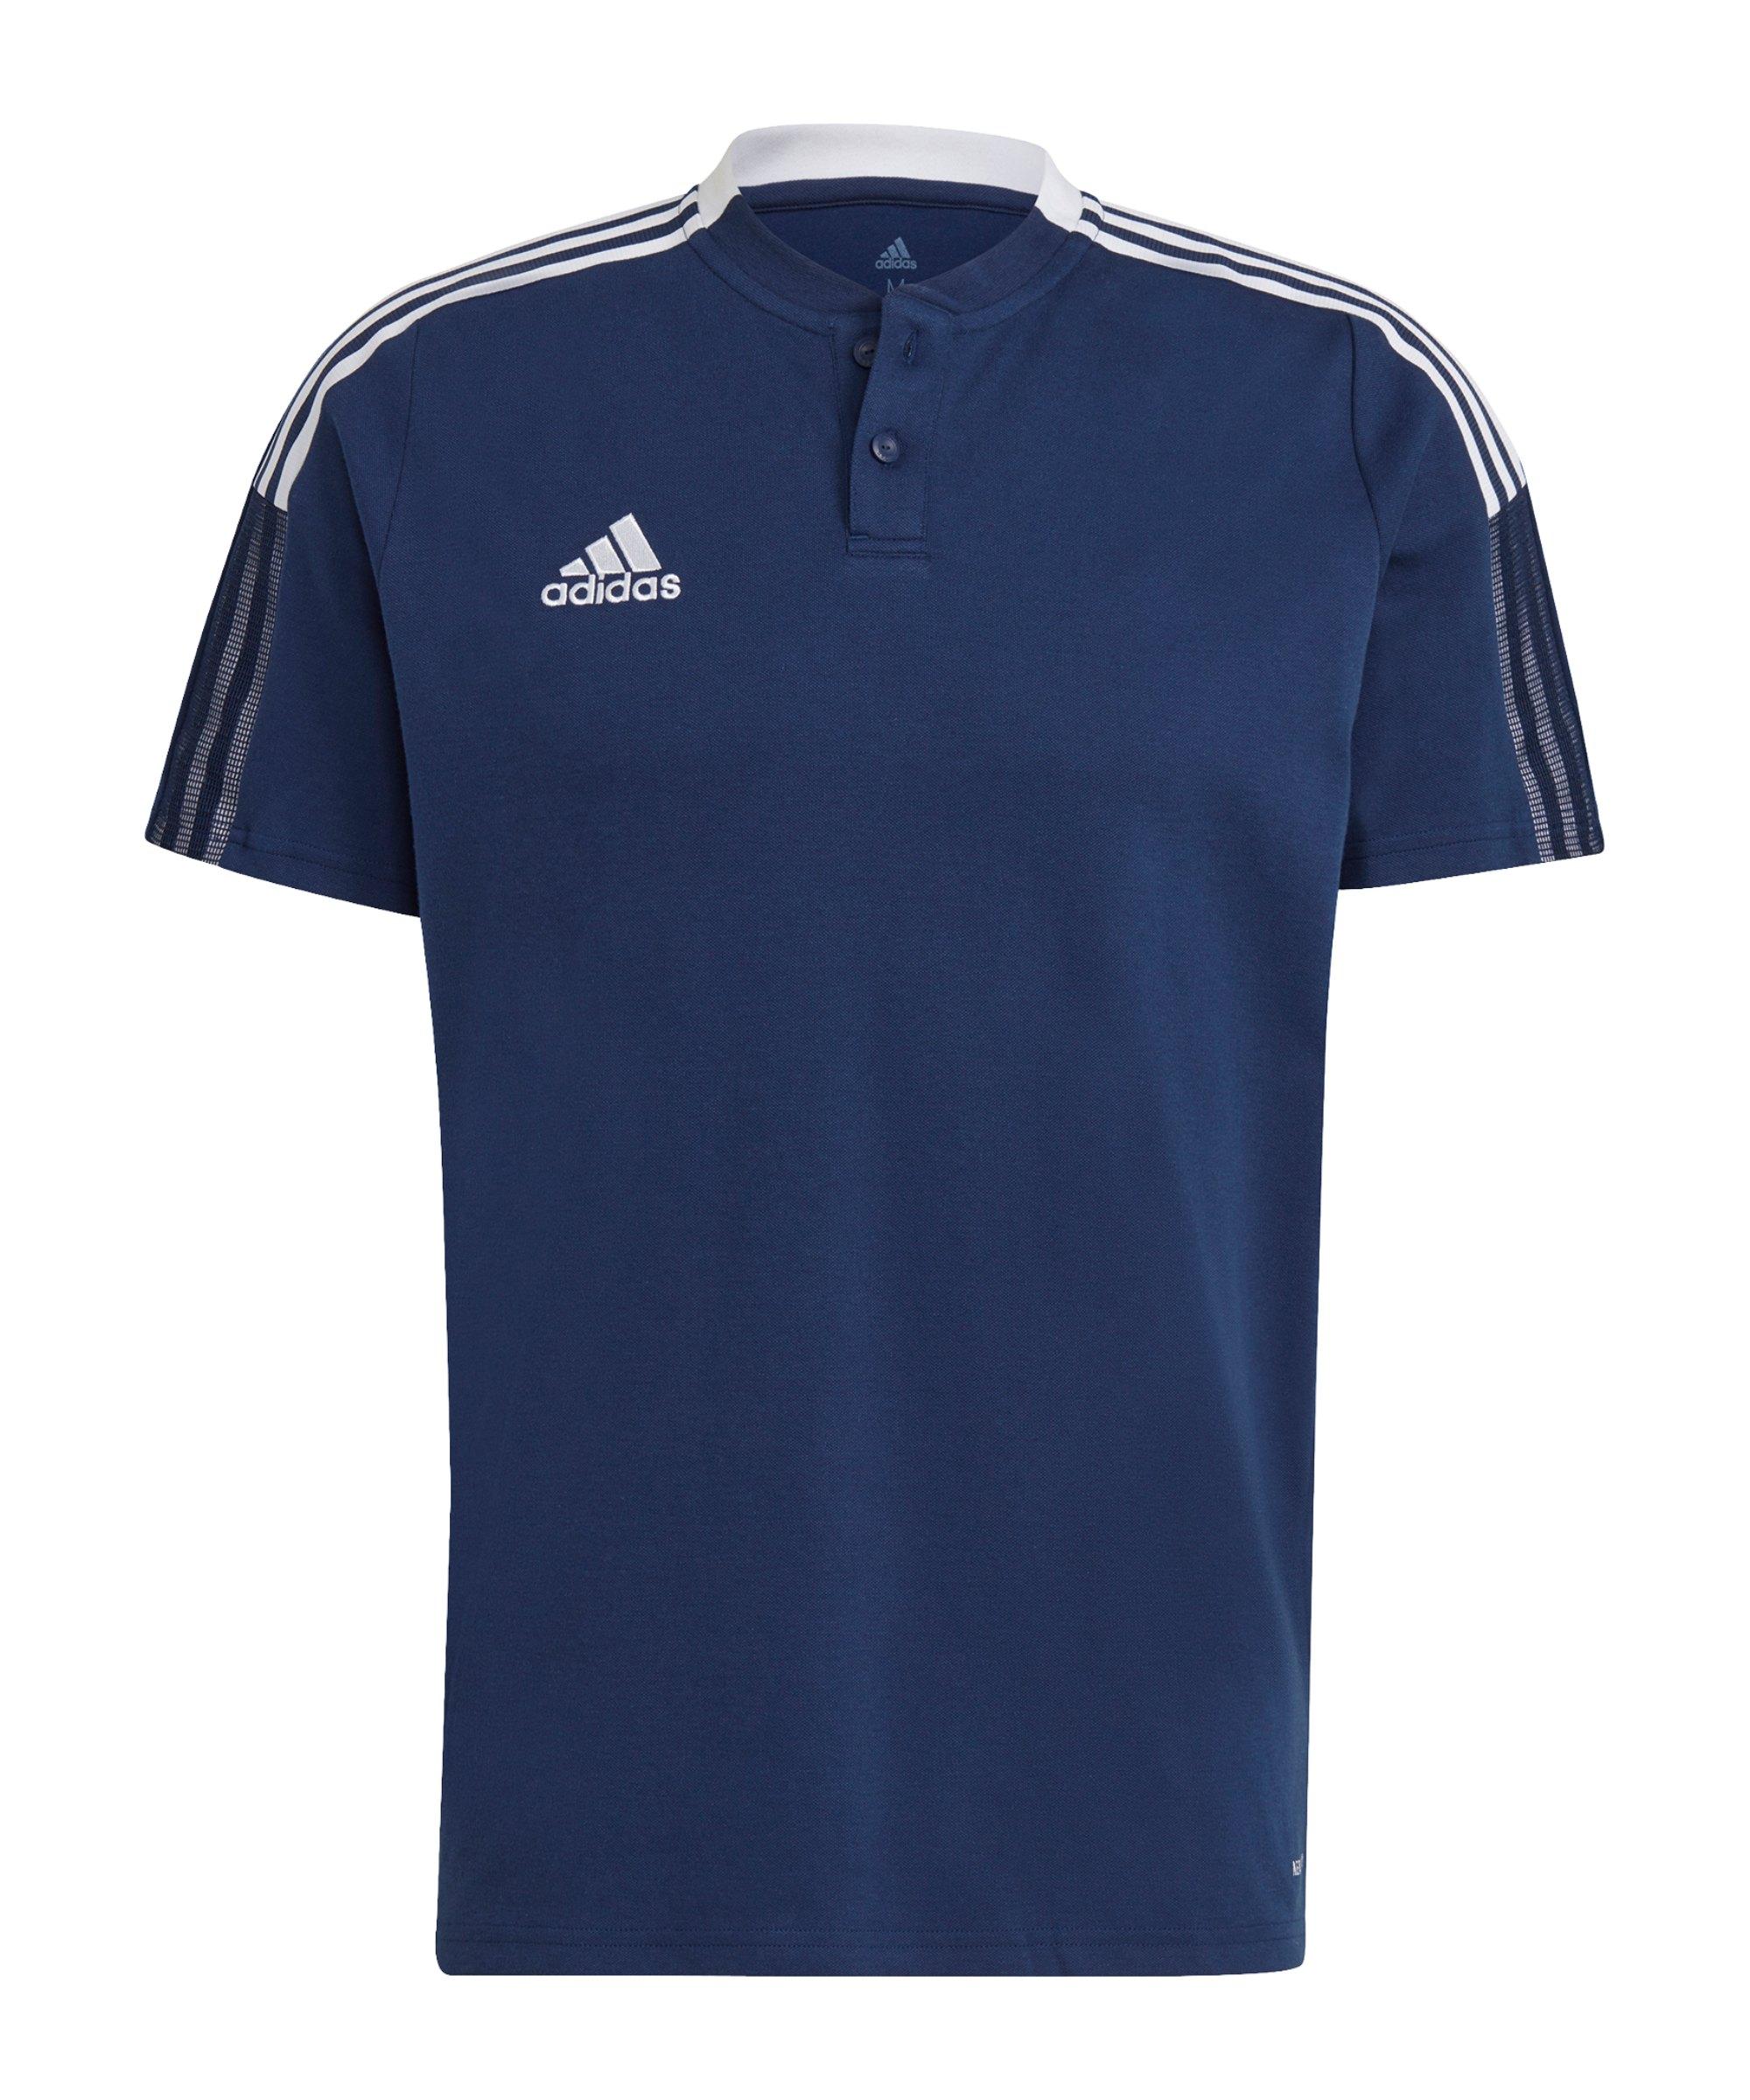 adidas Tiro 21 Poloshirt Dunkelblau - blau